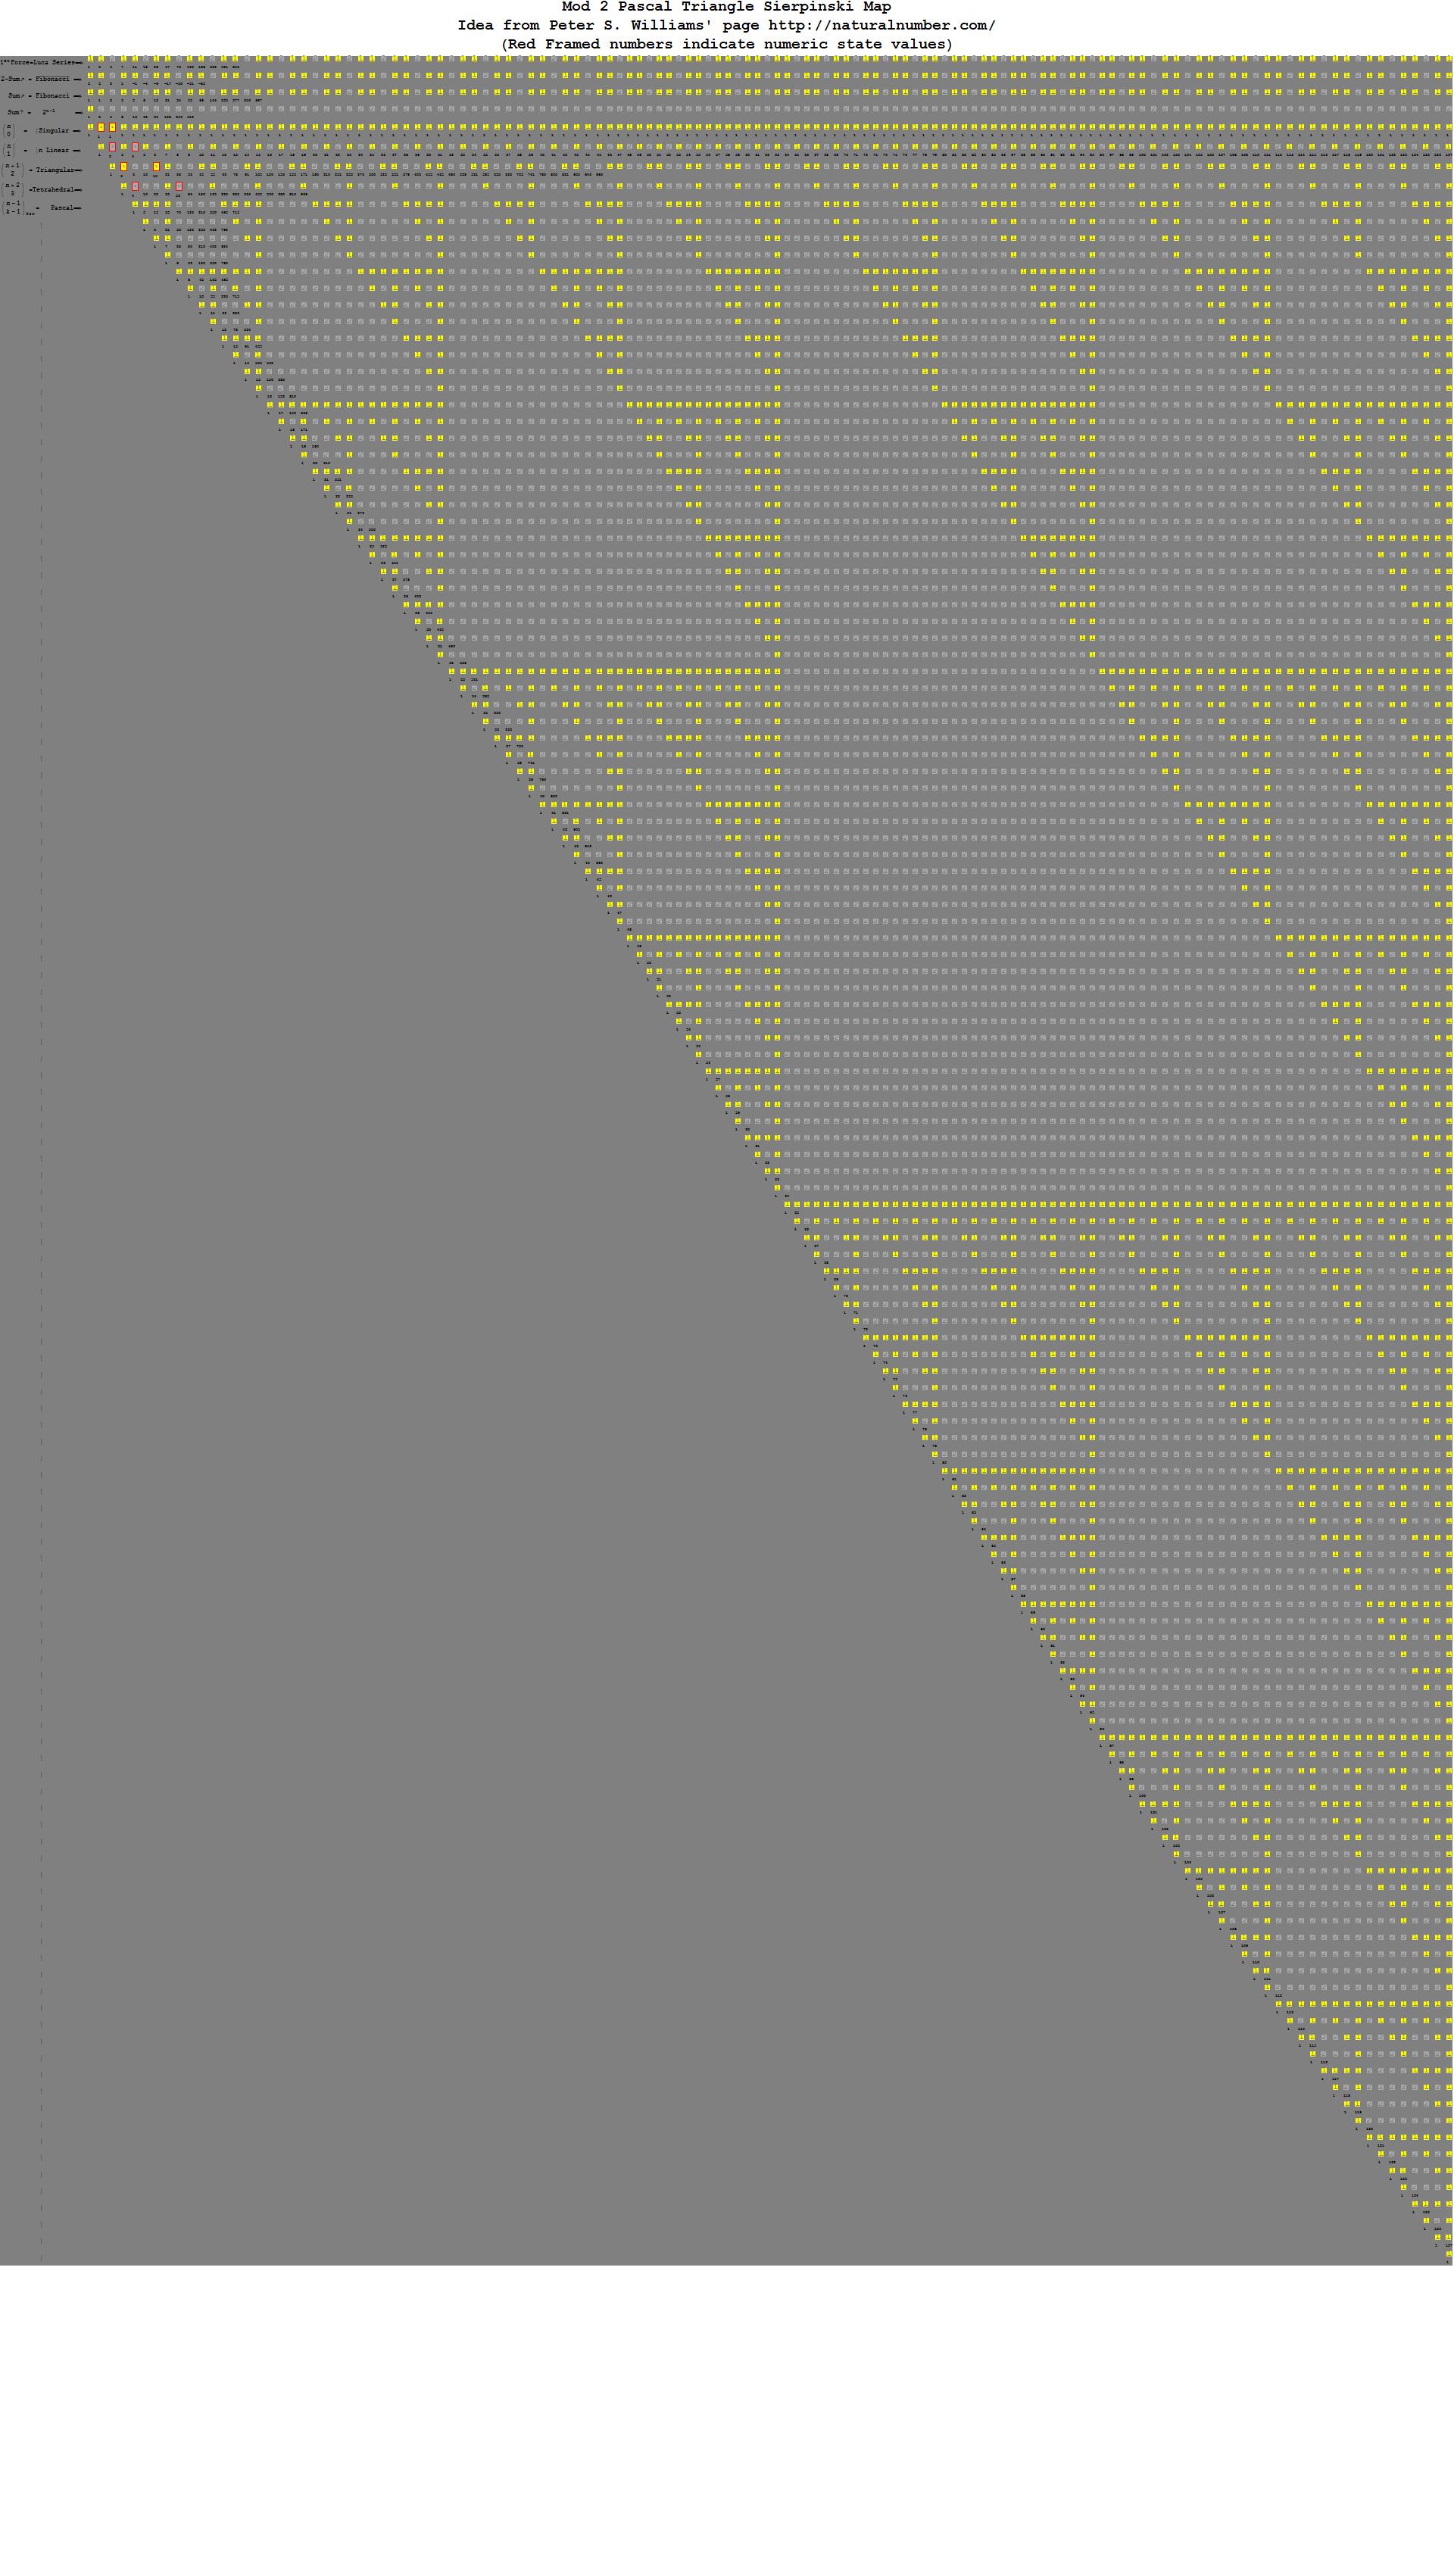 Pascal-Binary-Mod2-e